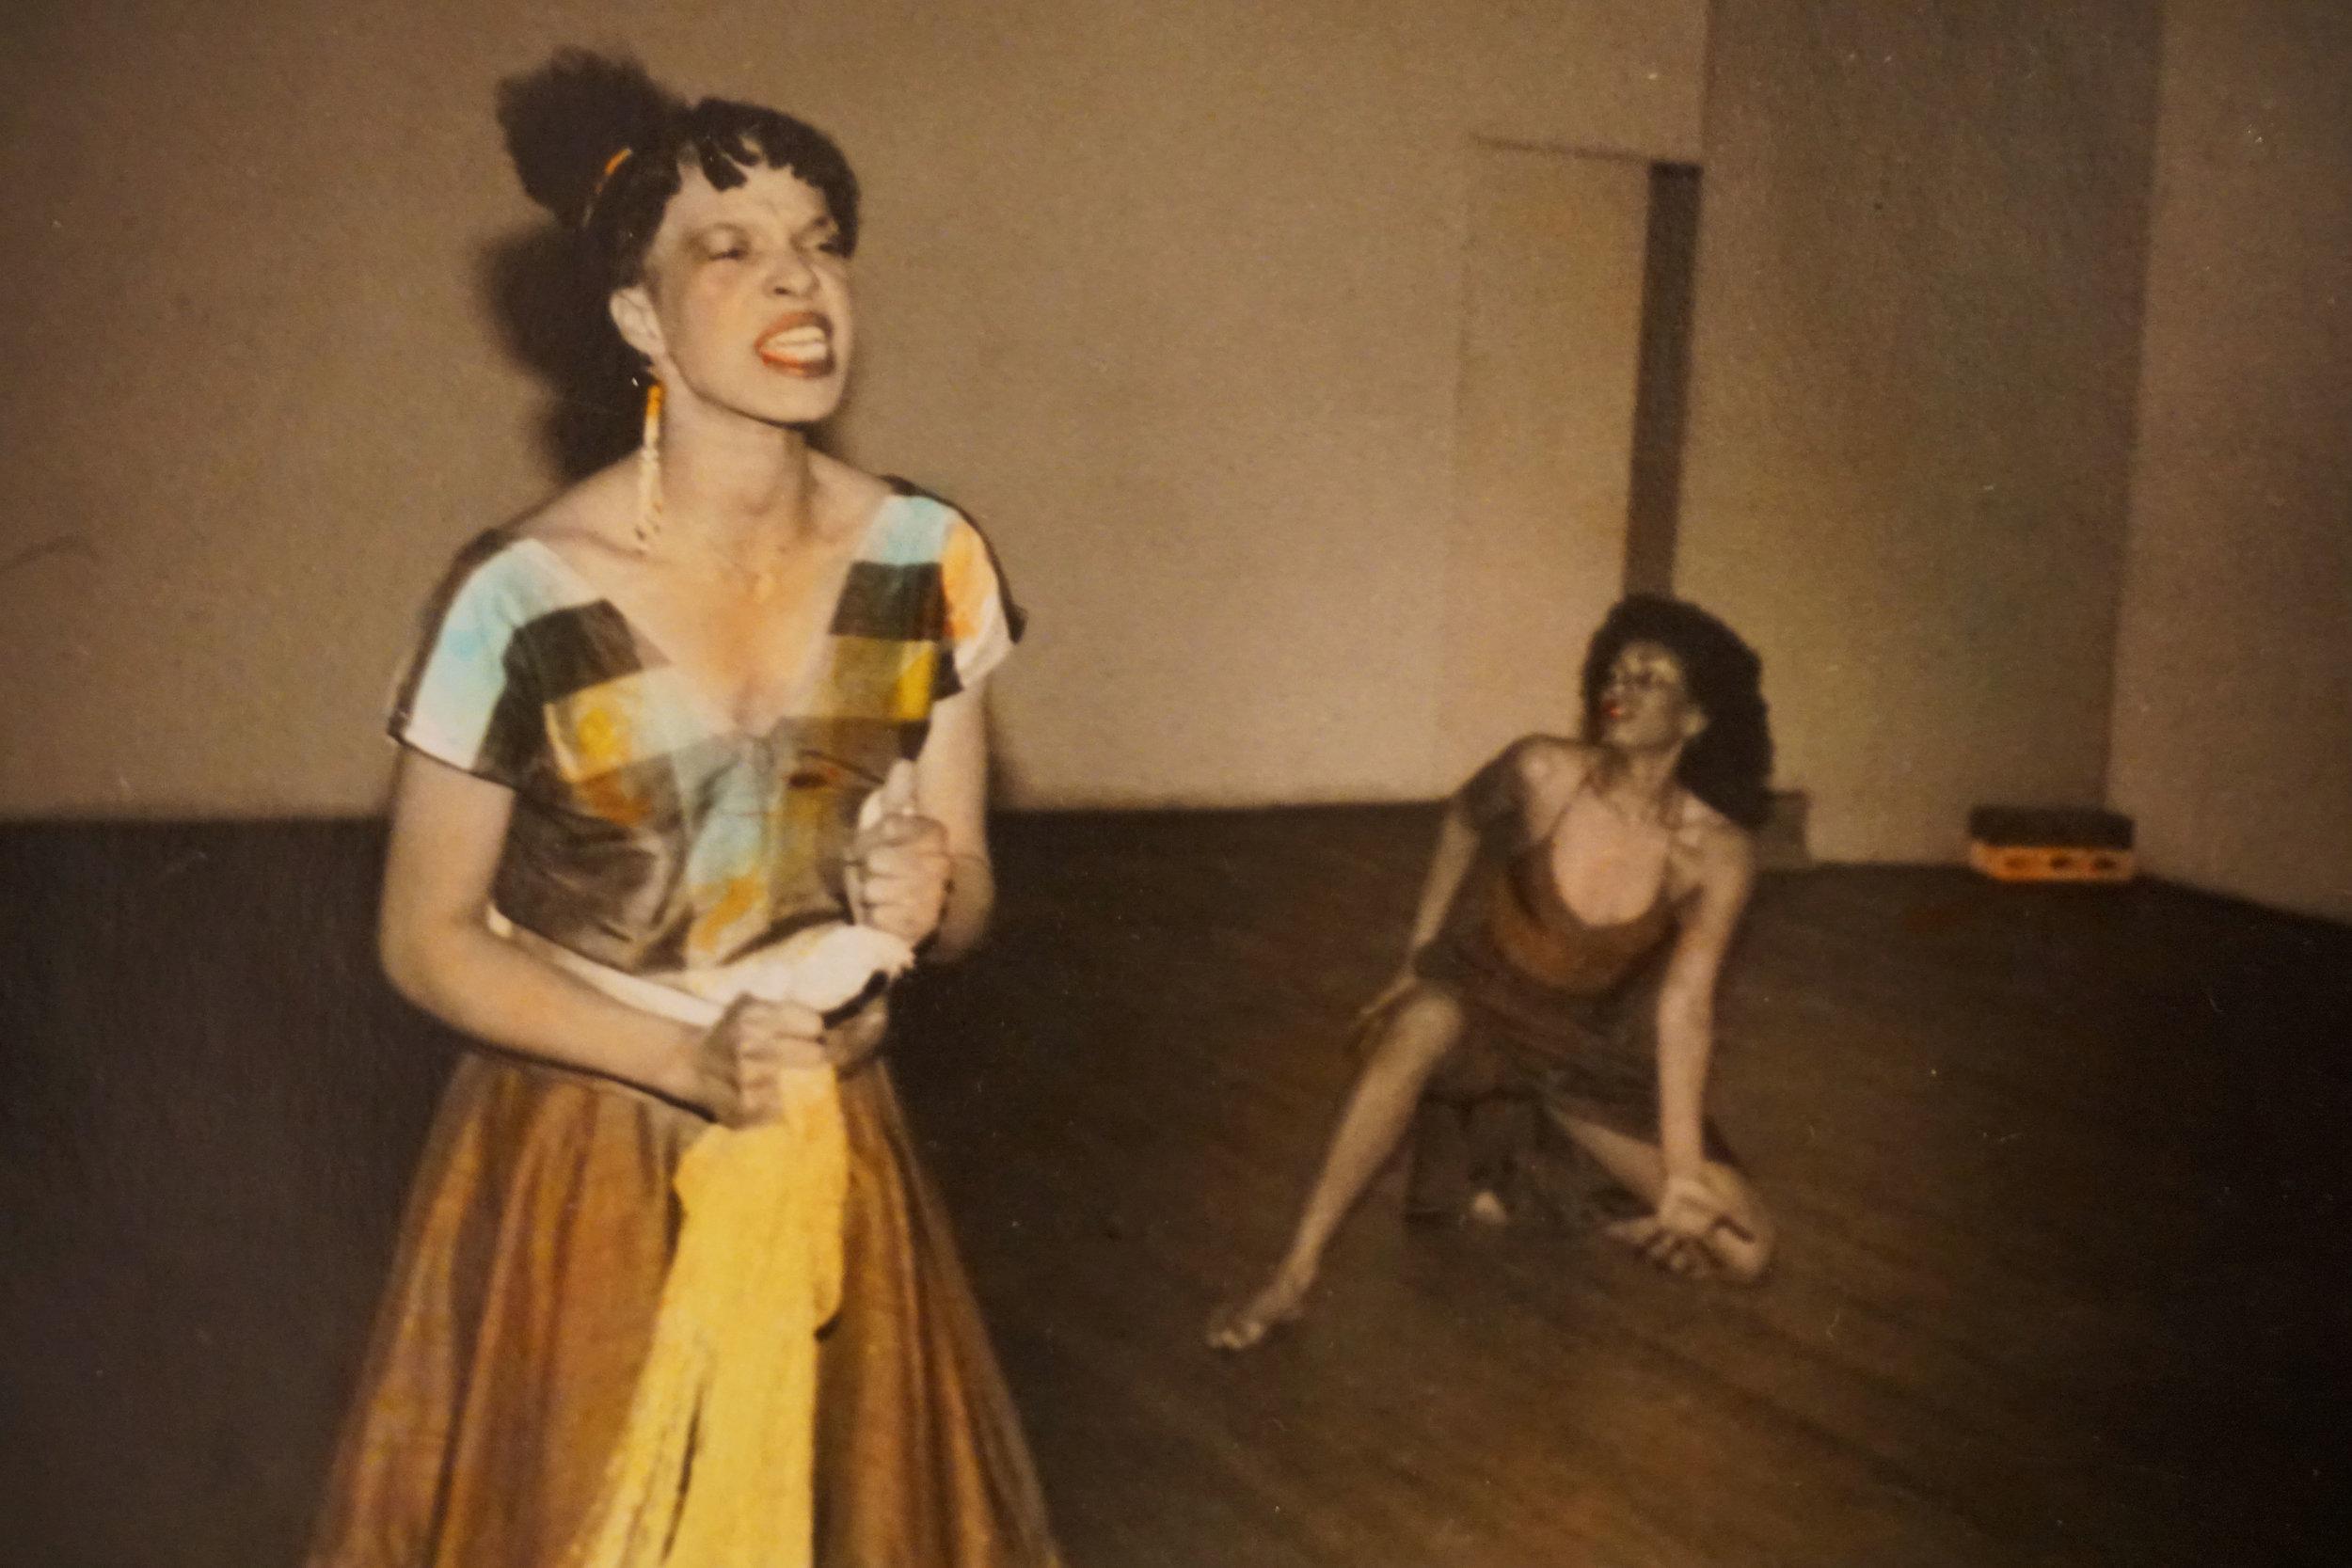 Hand colored B/w Photo taken by Nina Kuo at Basement Wkshop c 1980's with Jessica Hagedorn and Thulani Davis etc.